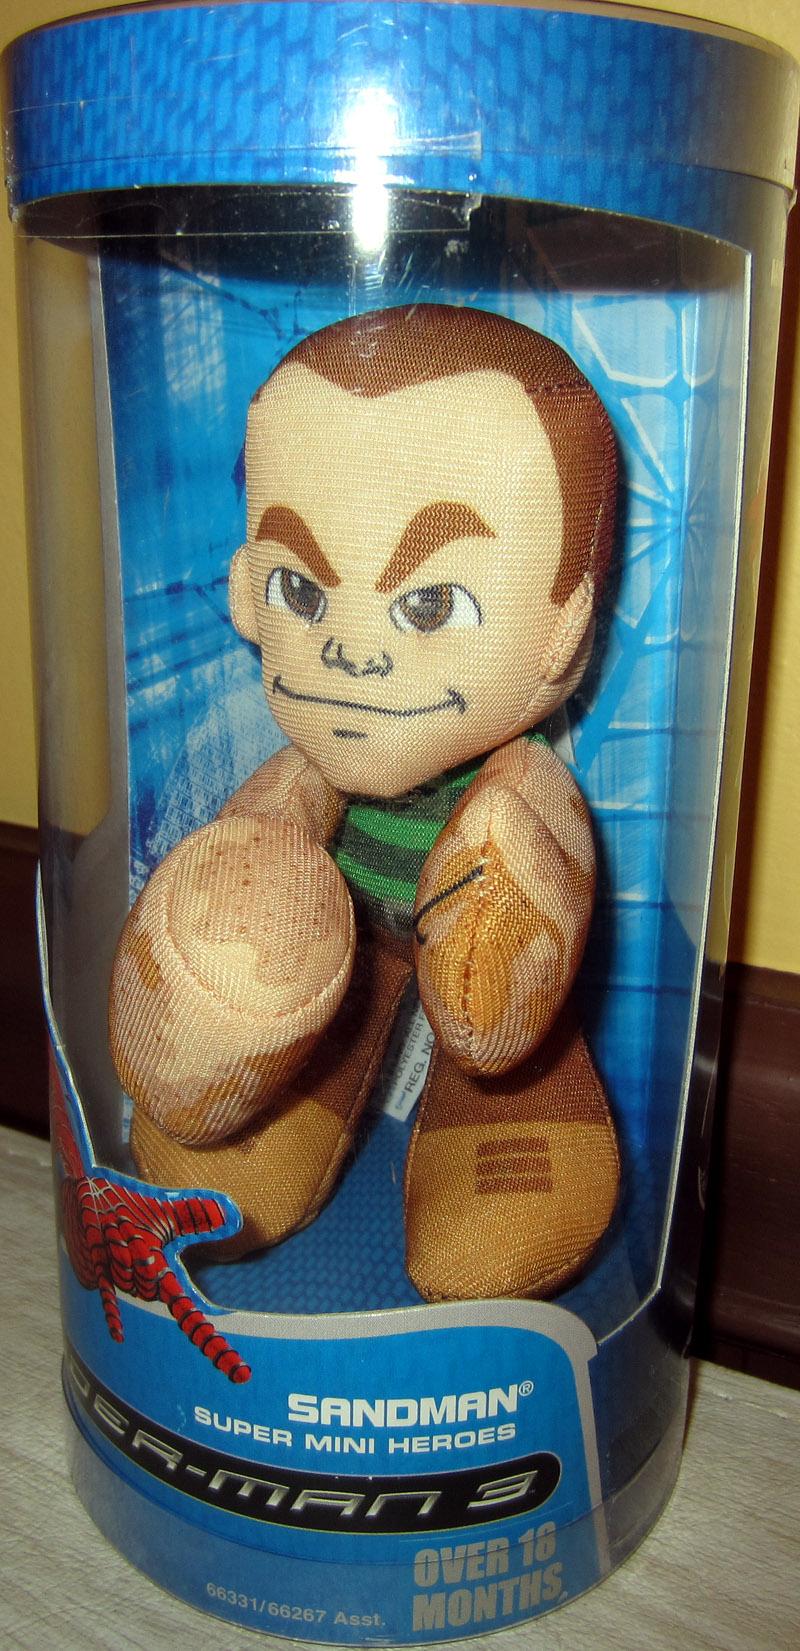 Sandman Super Mini Hero Plush Spider-Man 3 Hasbro